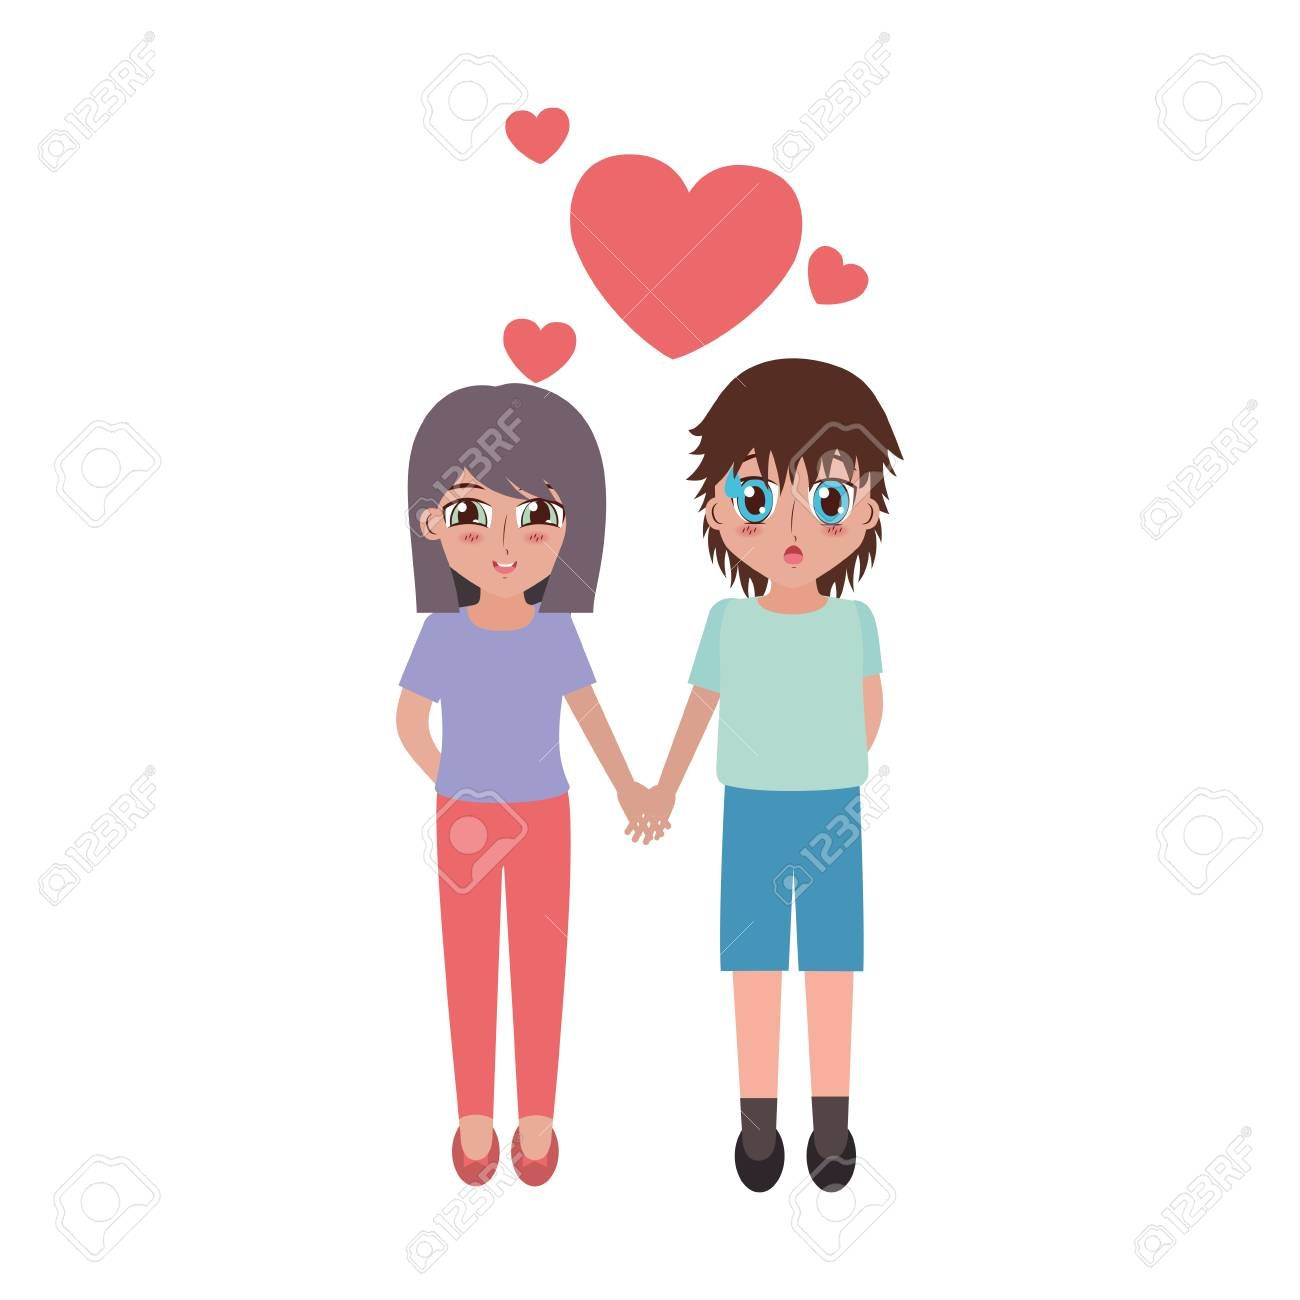 Girl And Boy Anime Love Hearts Vector Illustration Spon Anime Boy Girl Love Illustrati Branding Design Logo Brochure Design Inspiration Anime Love